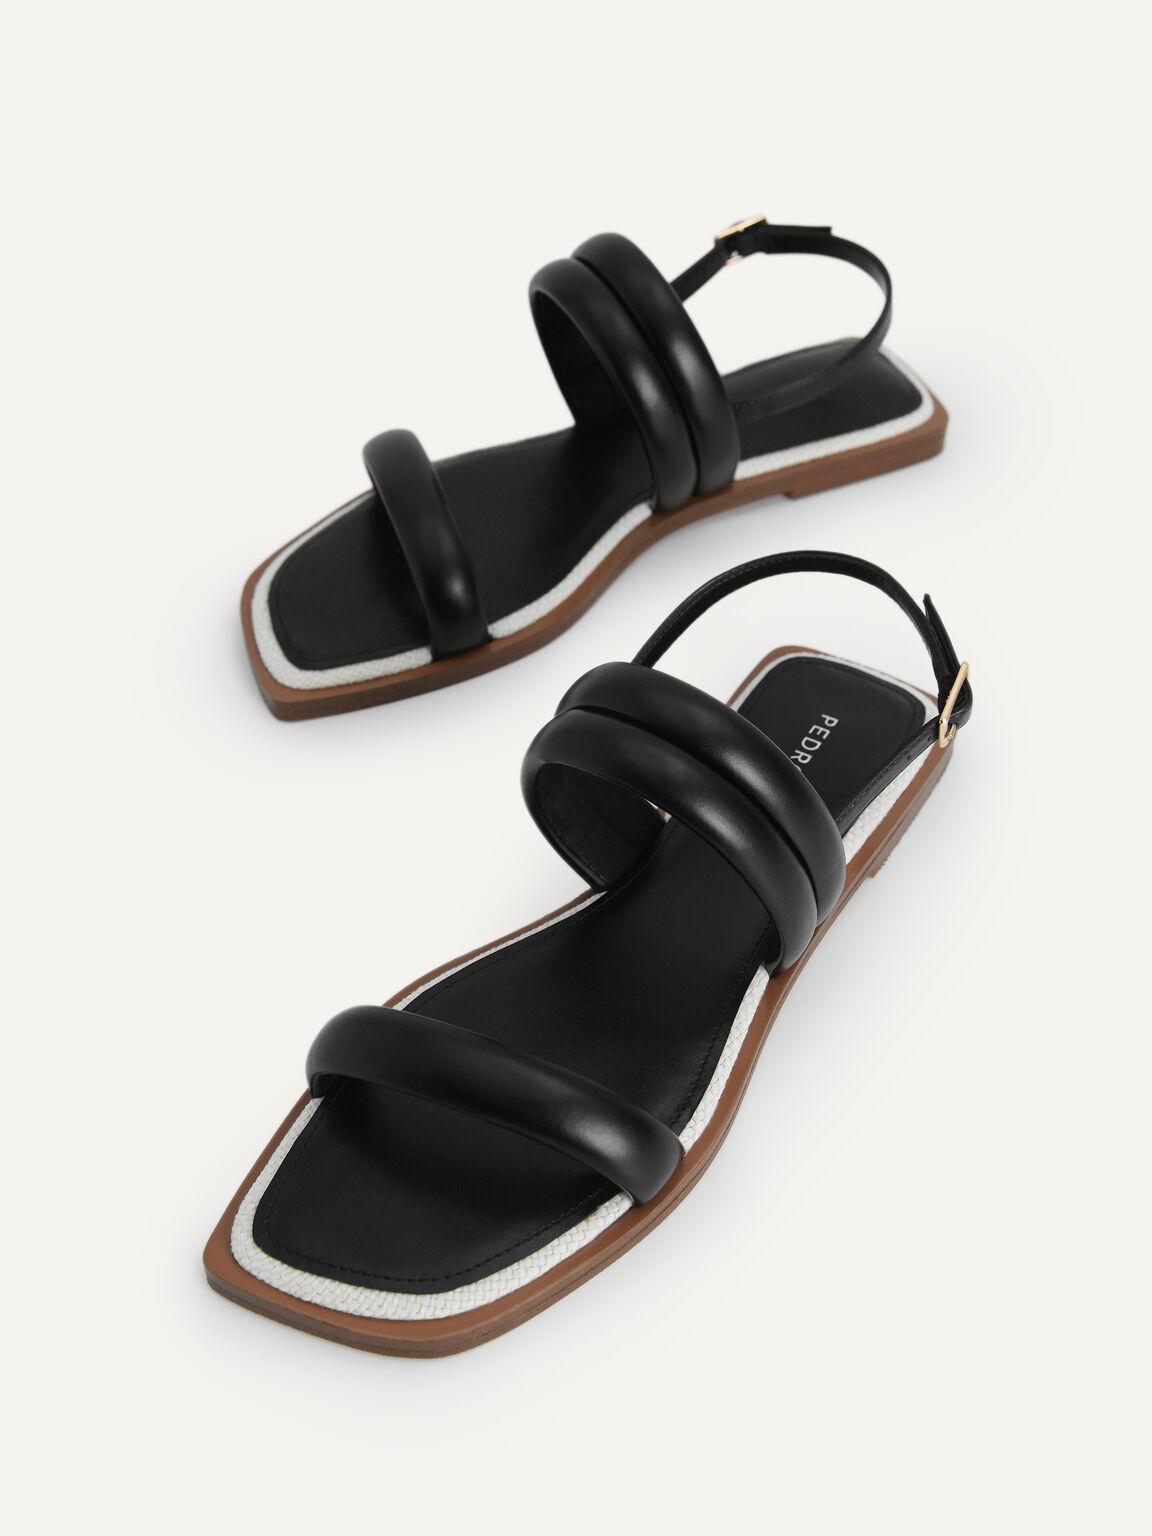 Double Strap Slingback Sandals, Black, hi-res